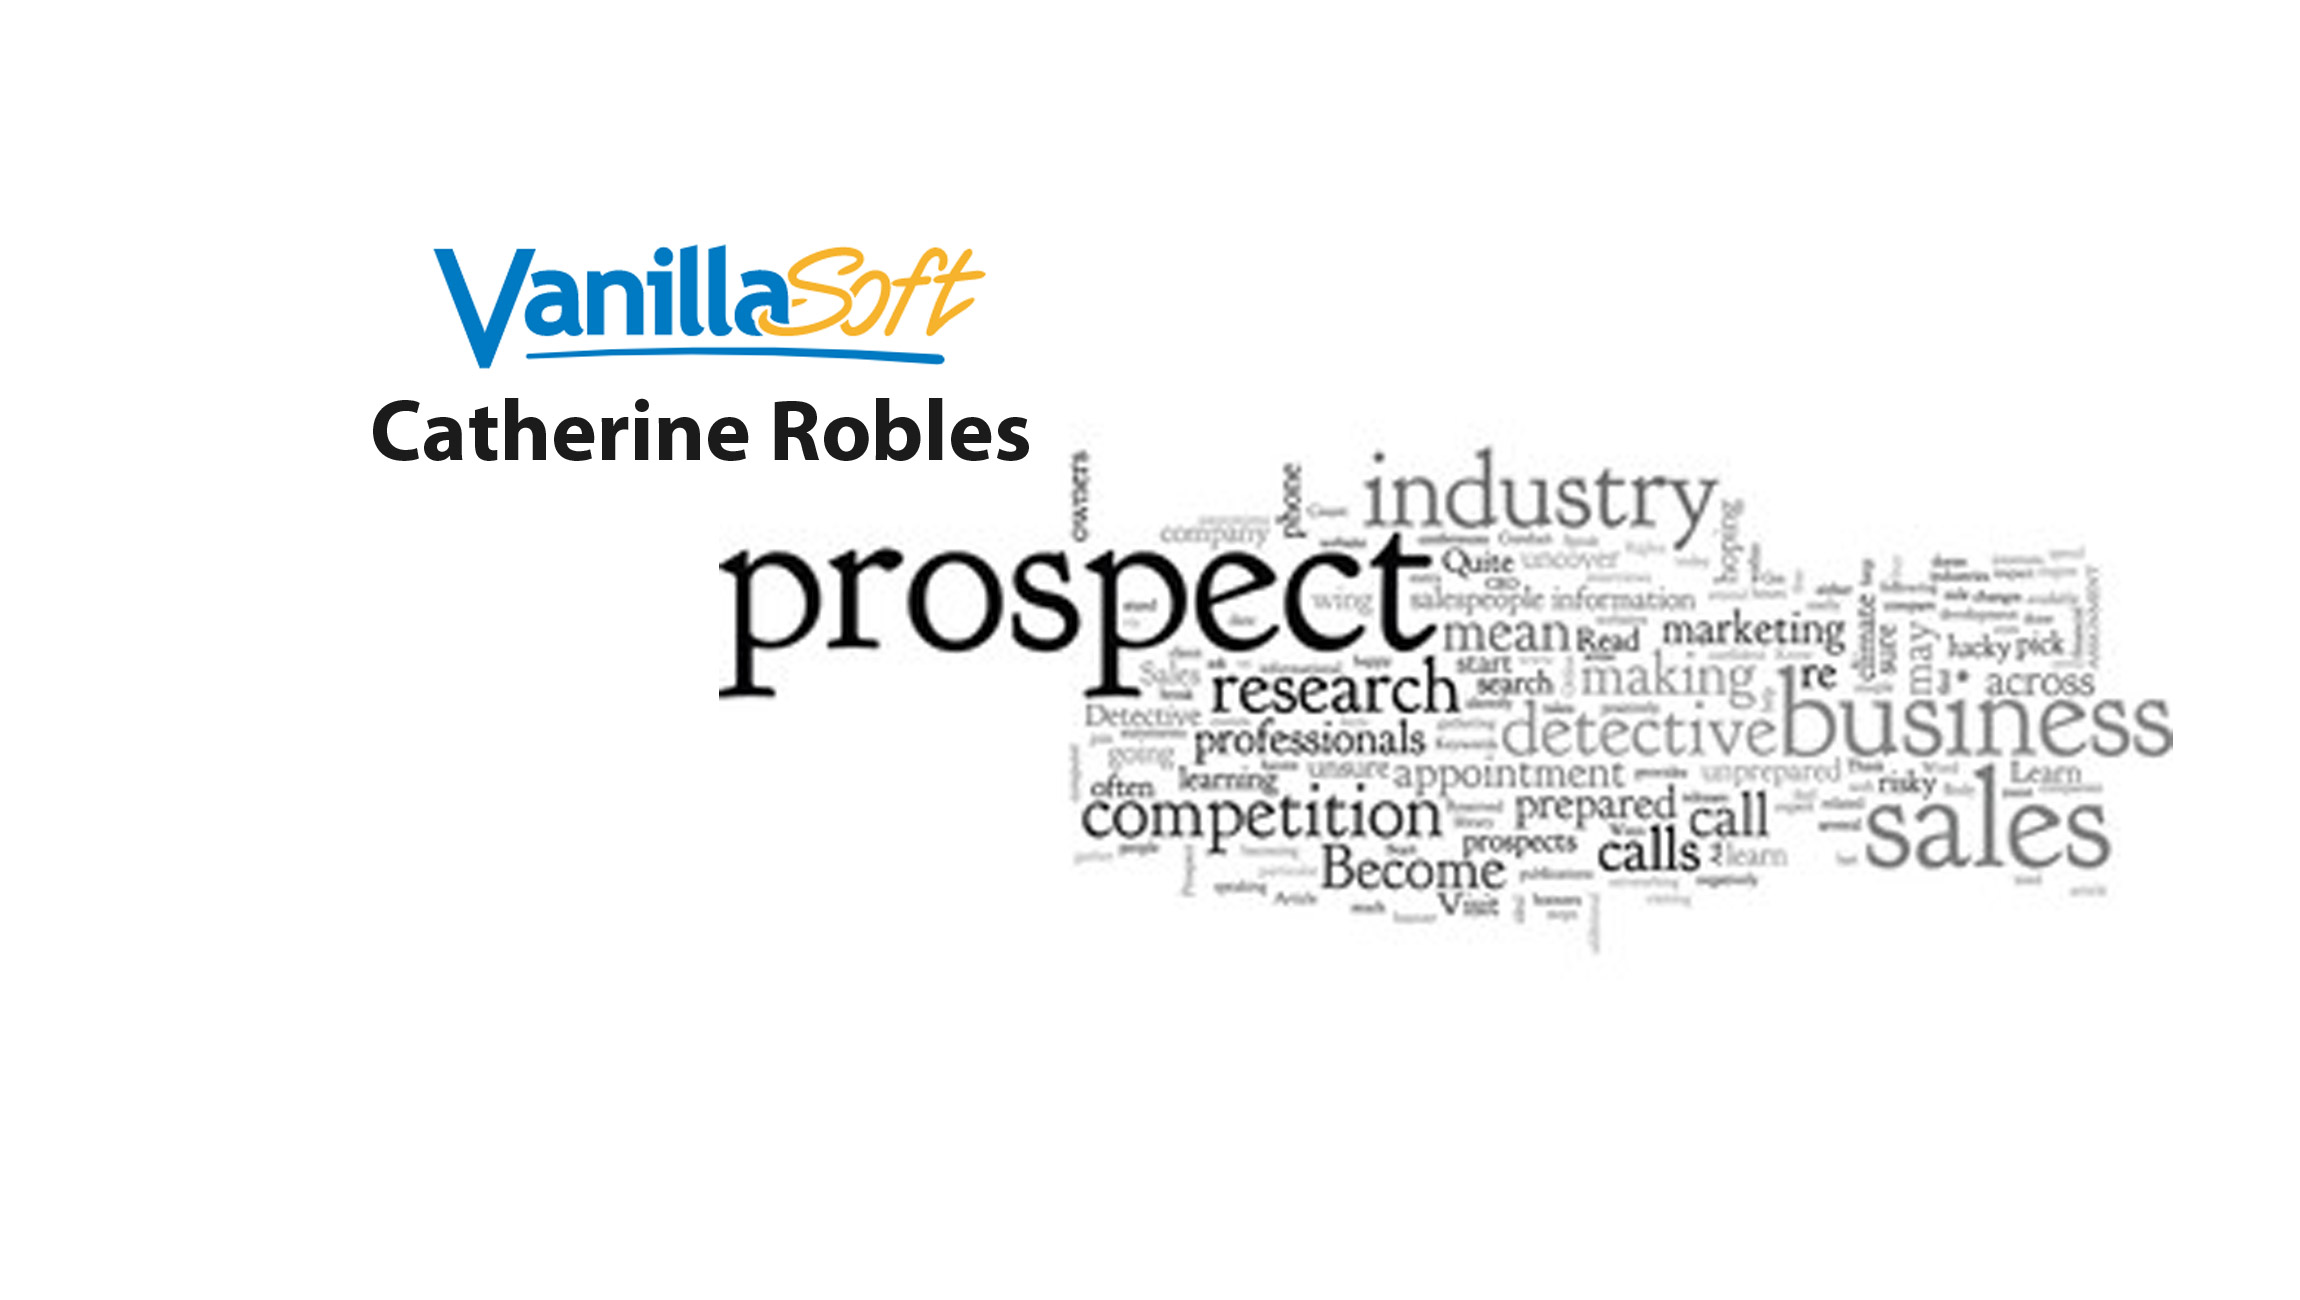 Catherine-Robles_SalesTechStar-VanillaSoft-08July-guest